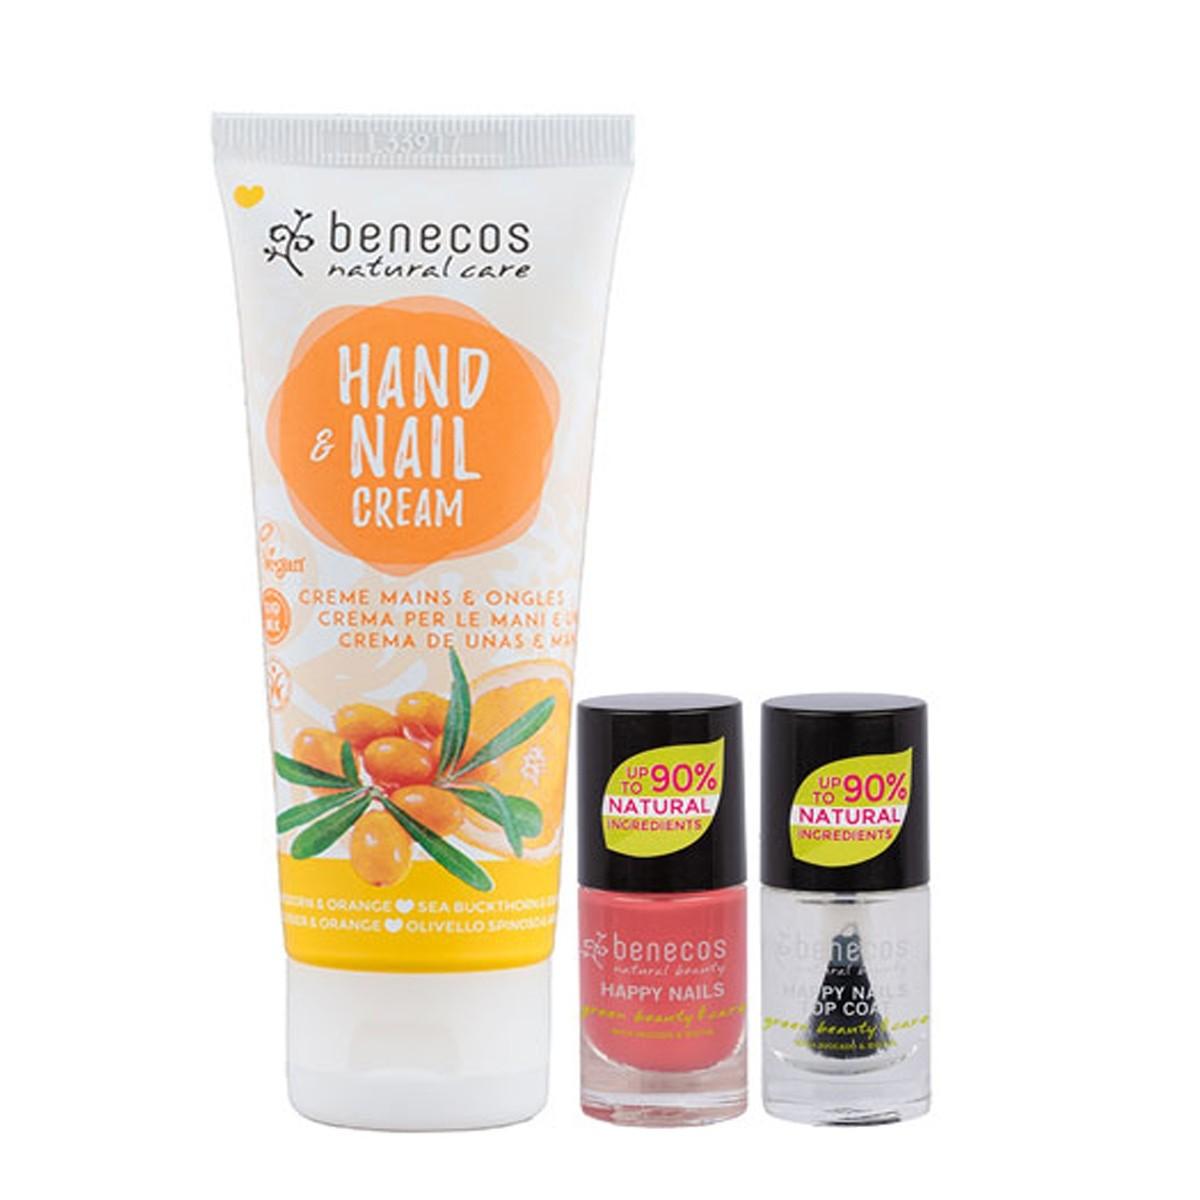 Benecos Hand & Nail Cream with Nail Polish Set